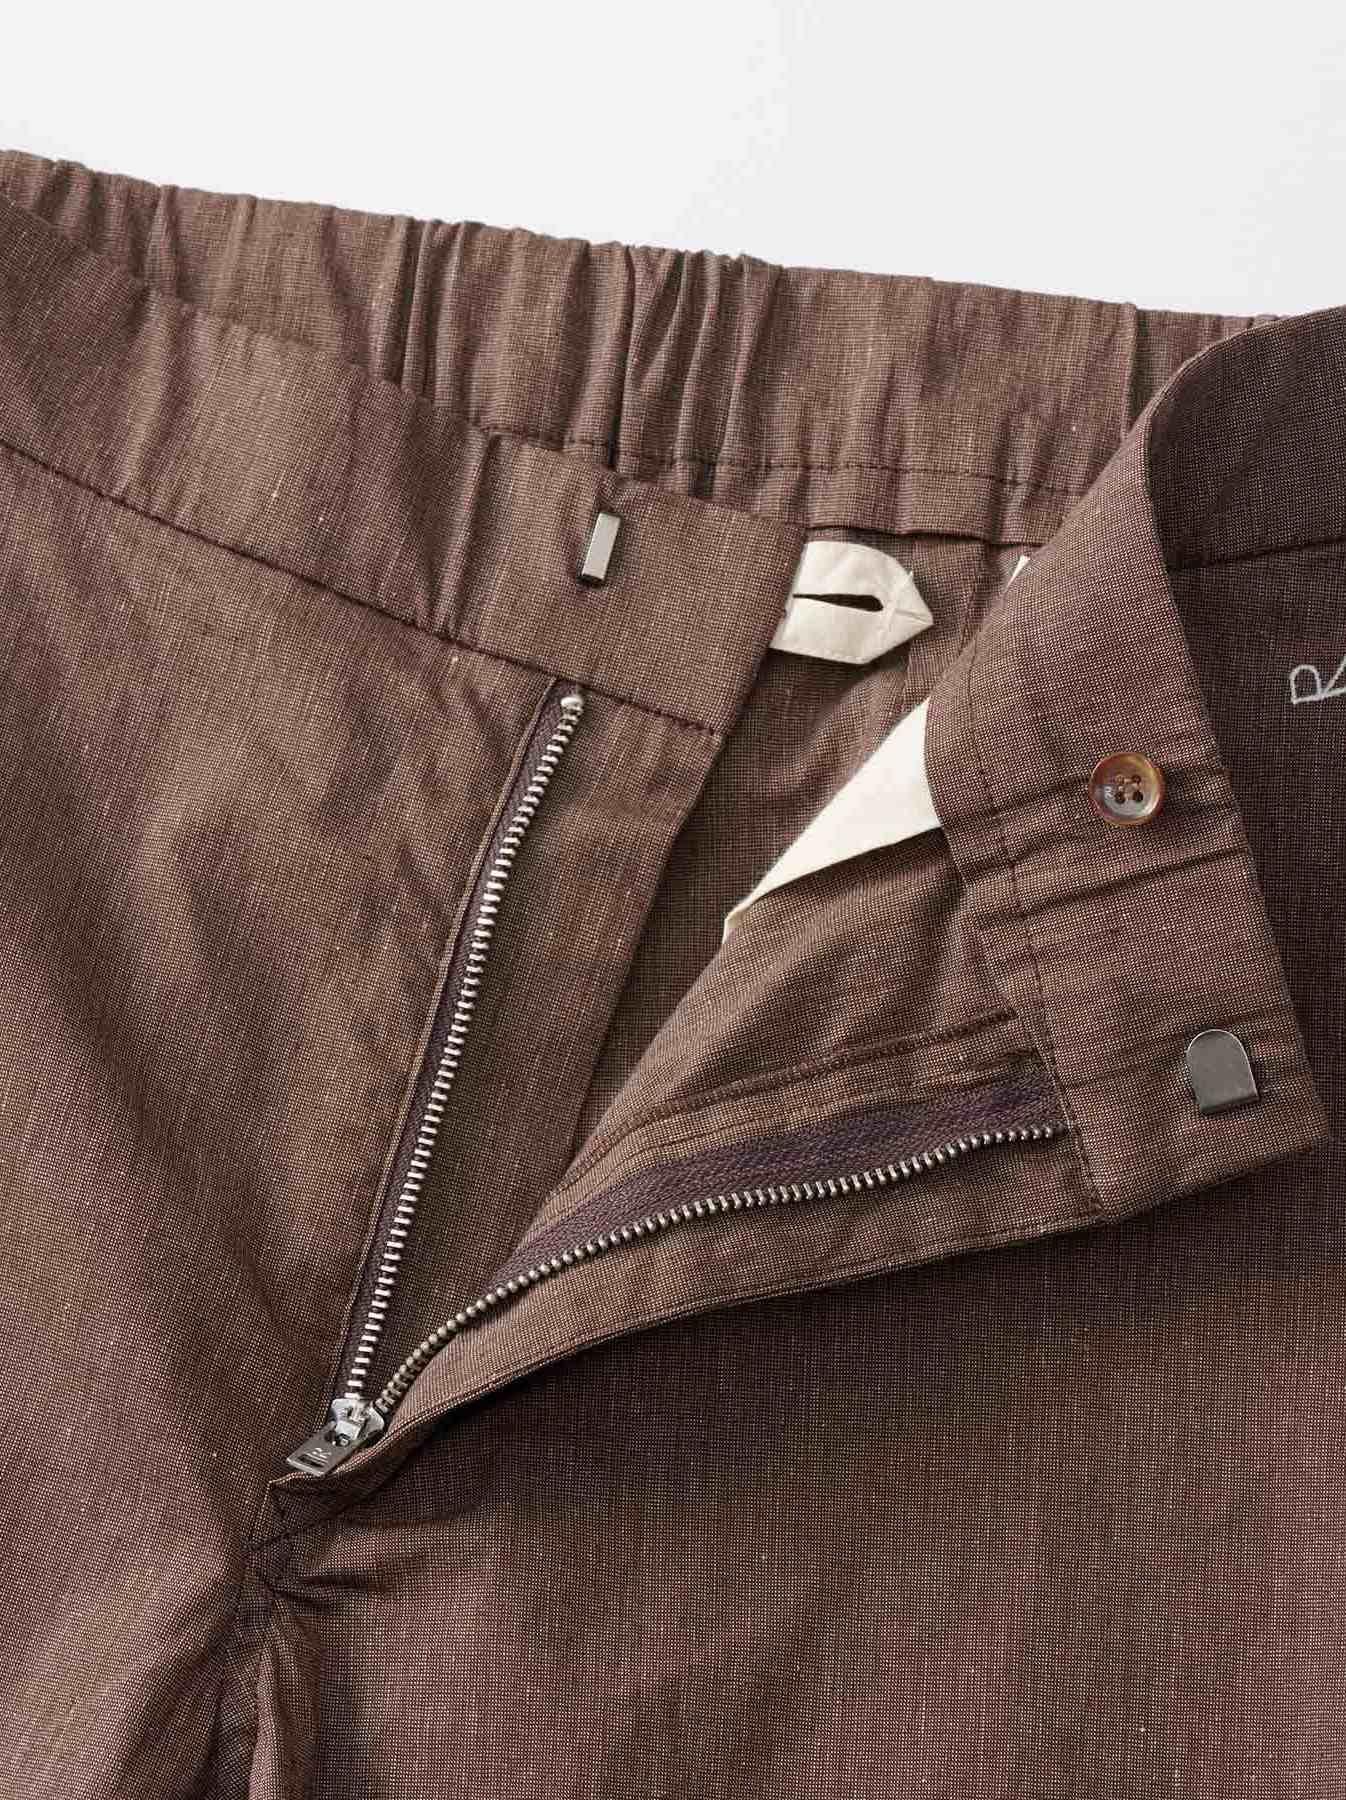 WH Cotton Linen Hakeme Stretch Pants-7